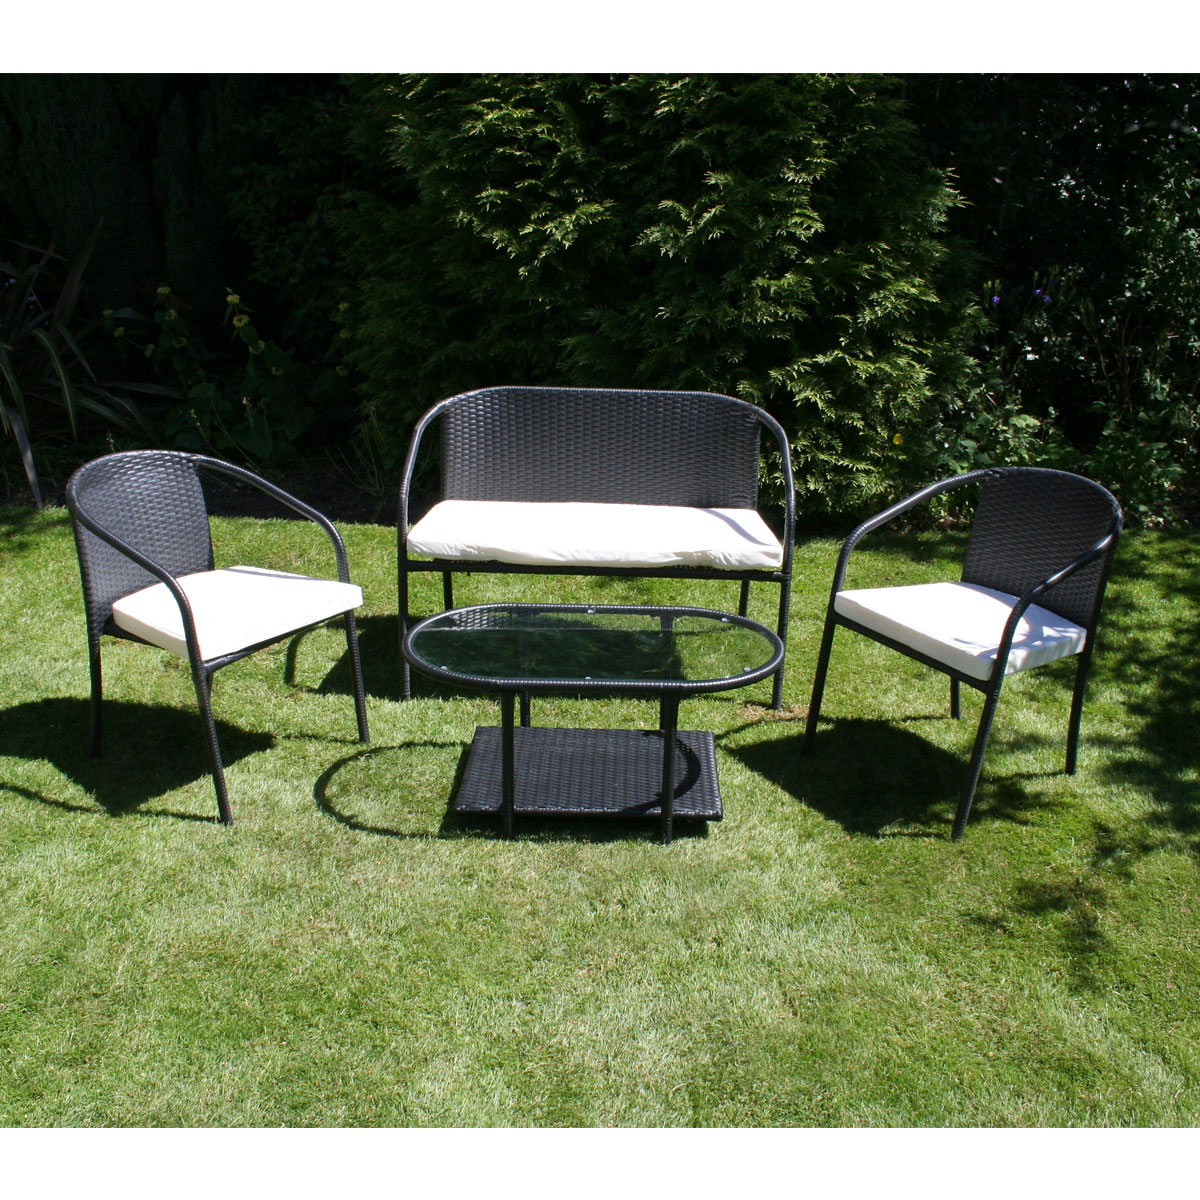 charles bentley outdoor patio 4 piece sofa black rattan furniture lounge set ebay. Black Bedroom Furniture Sets. Home Design Ideas